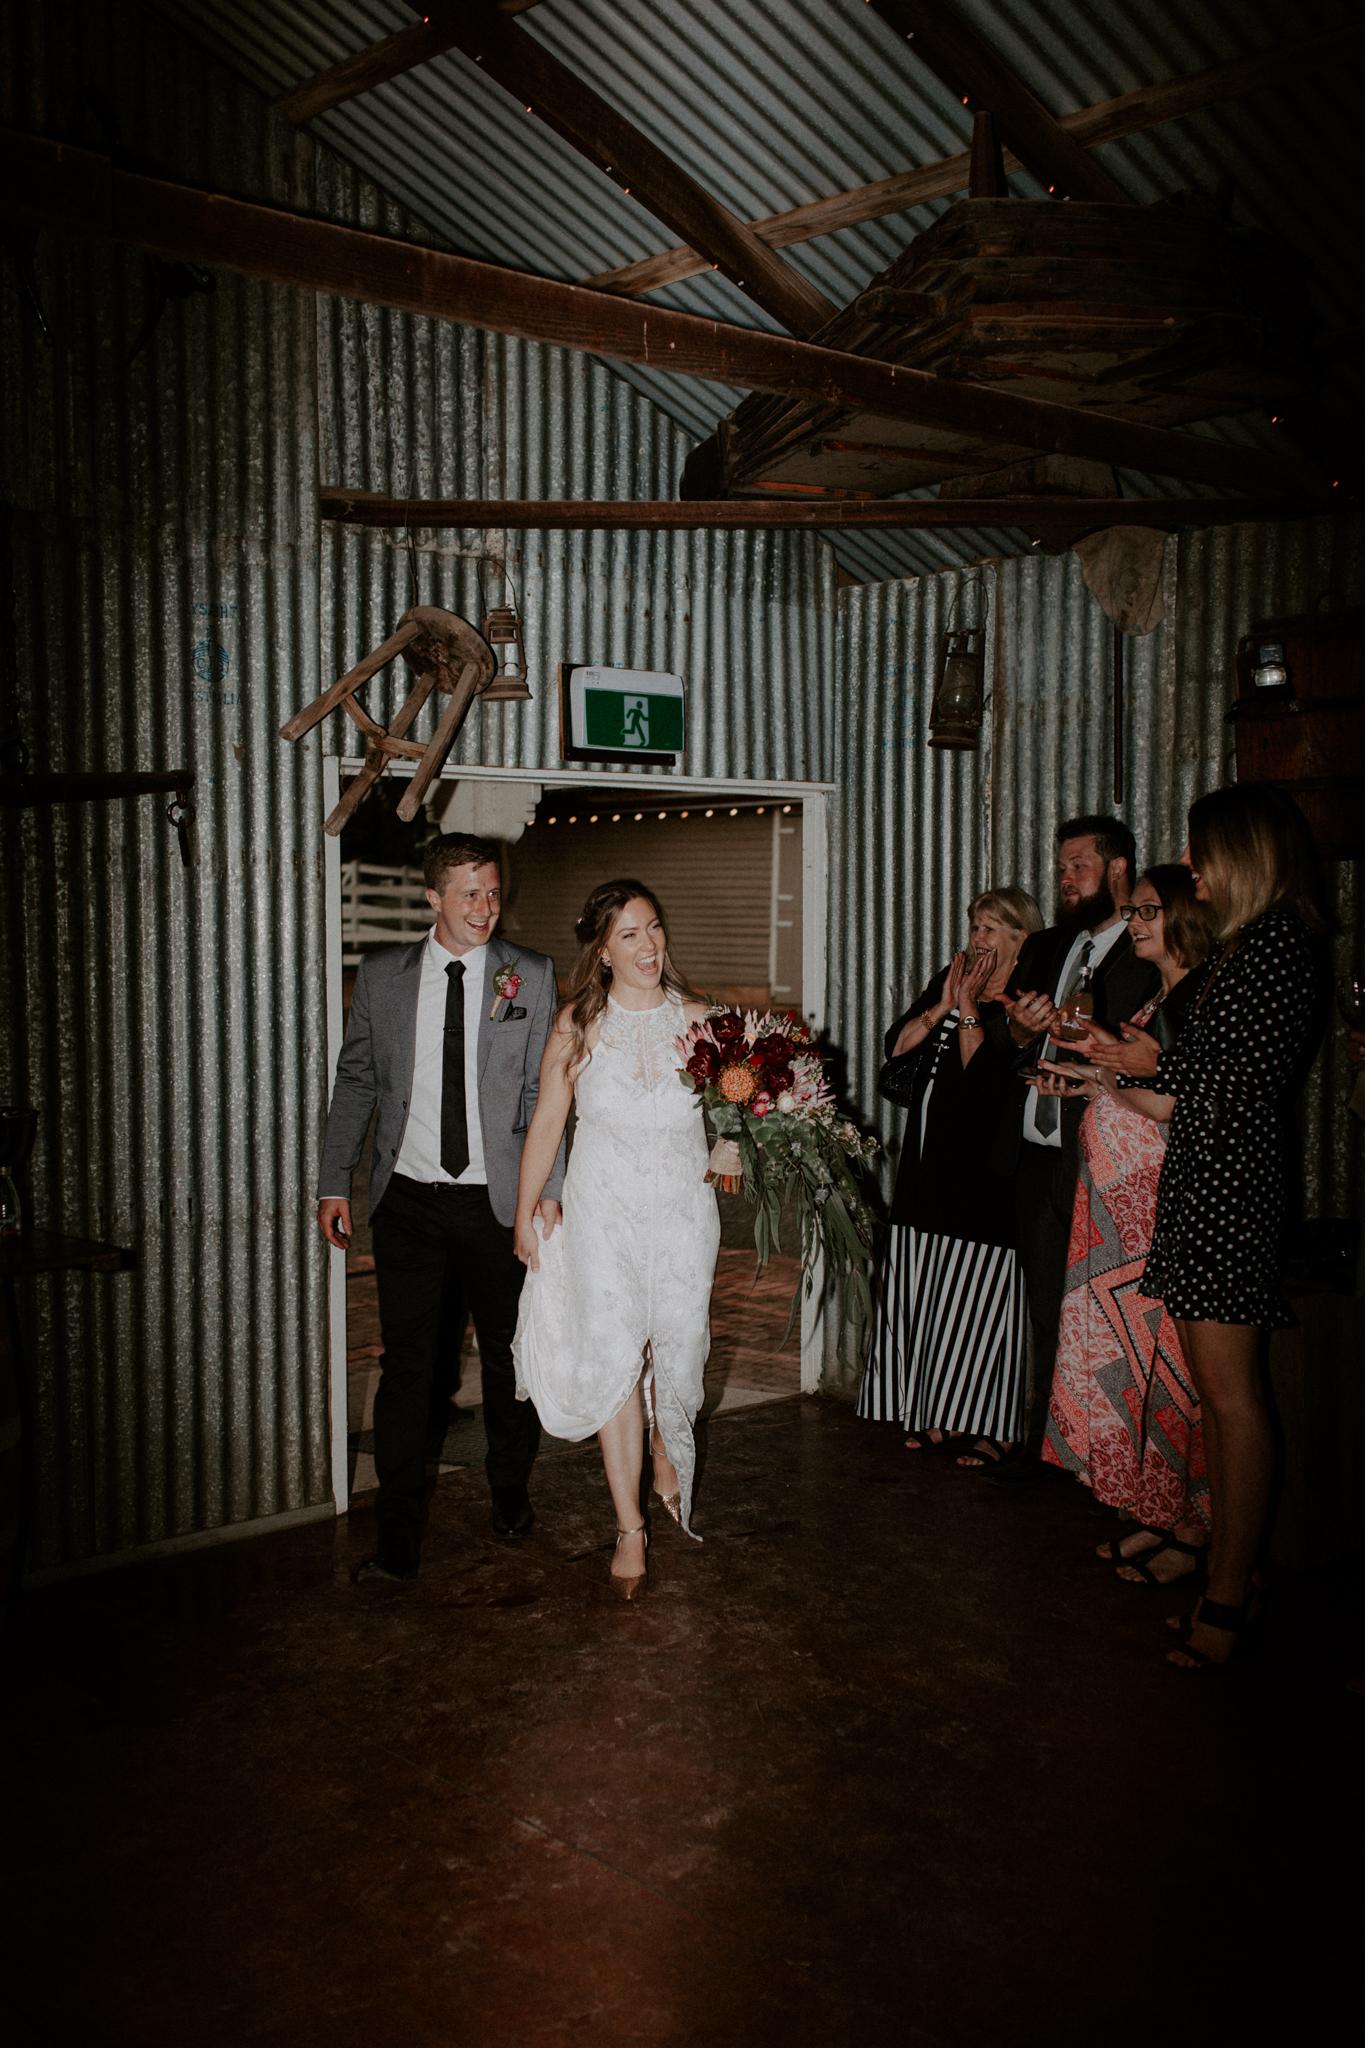 Wandin-Park-Estate-Wedding-Emotions-and-Math-Photography-103.jpg